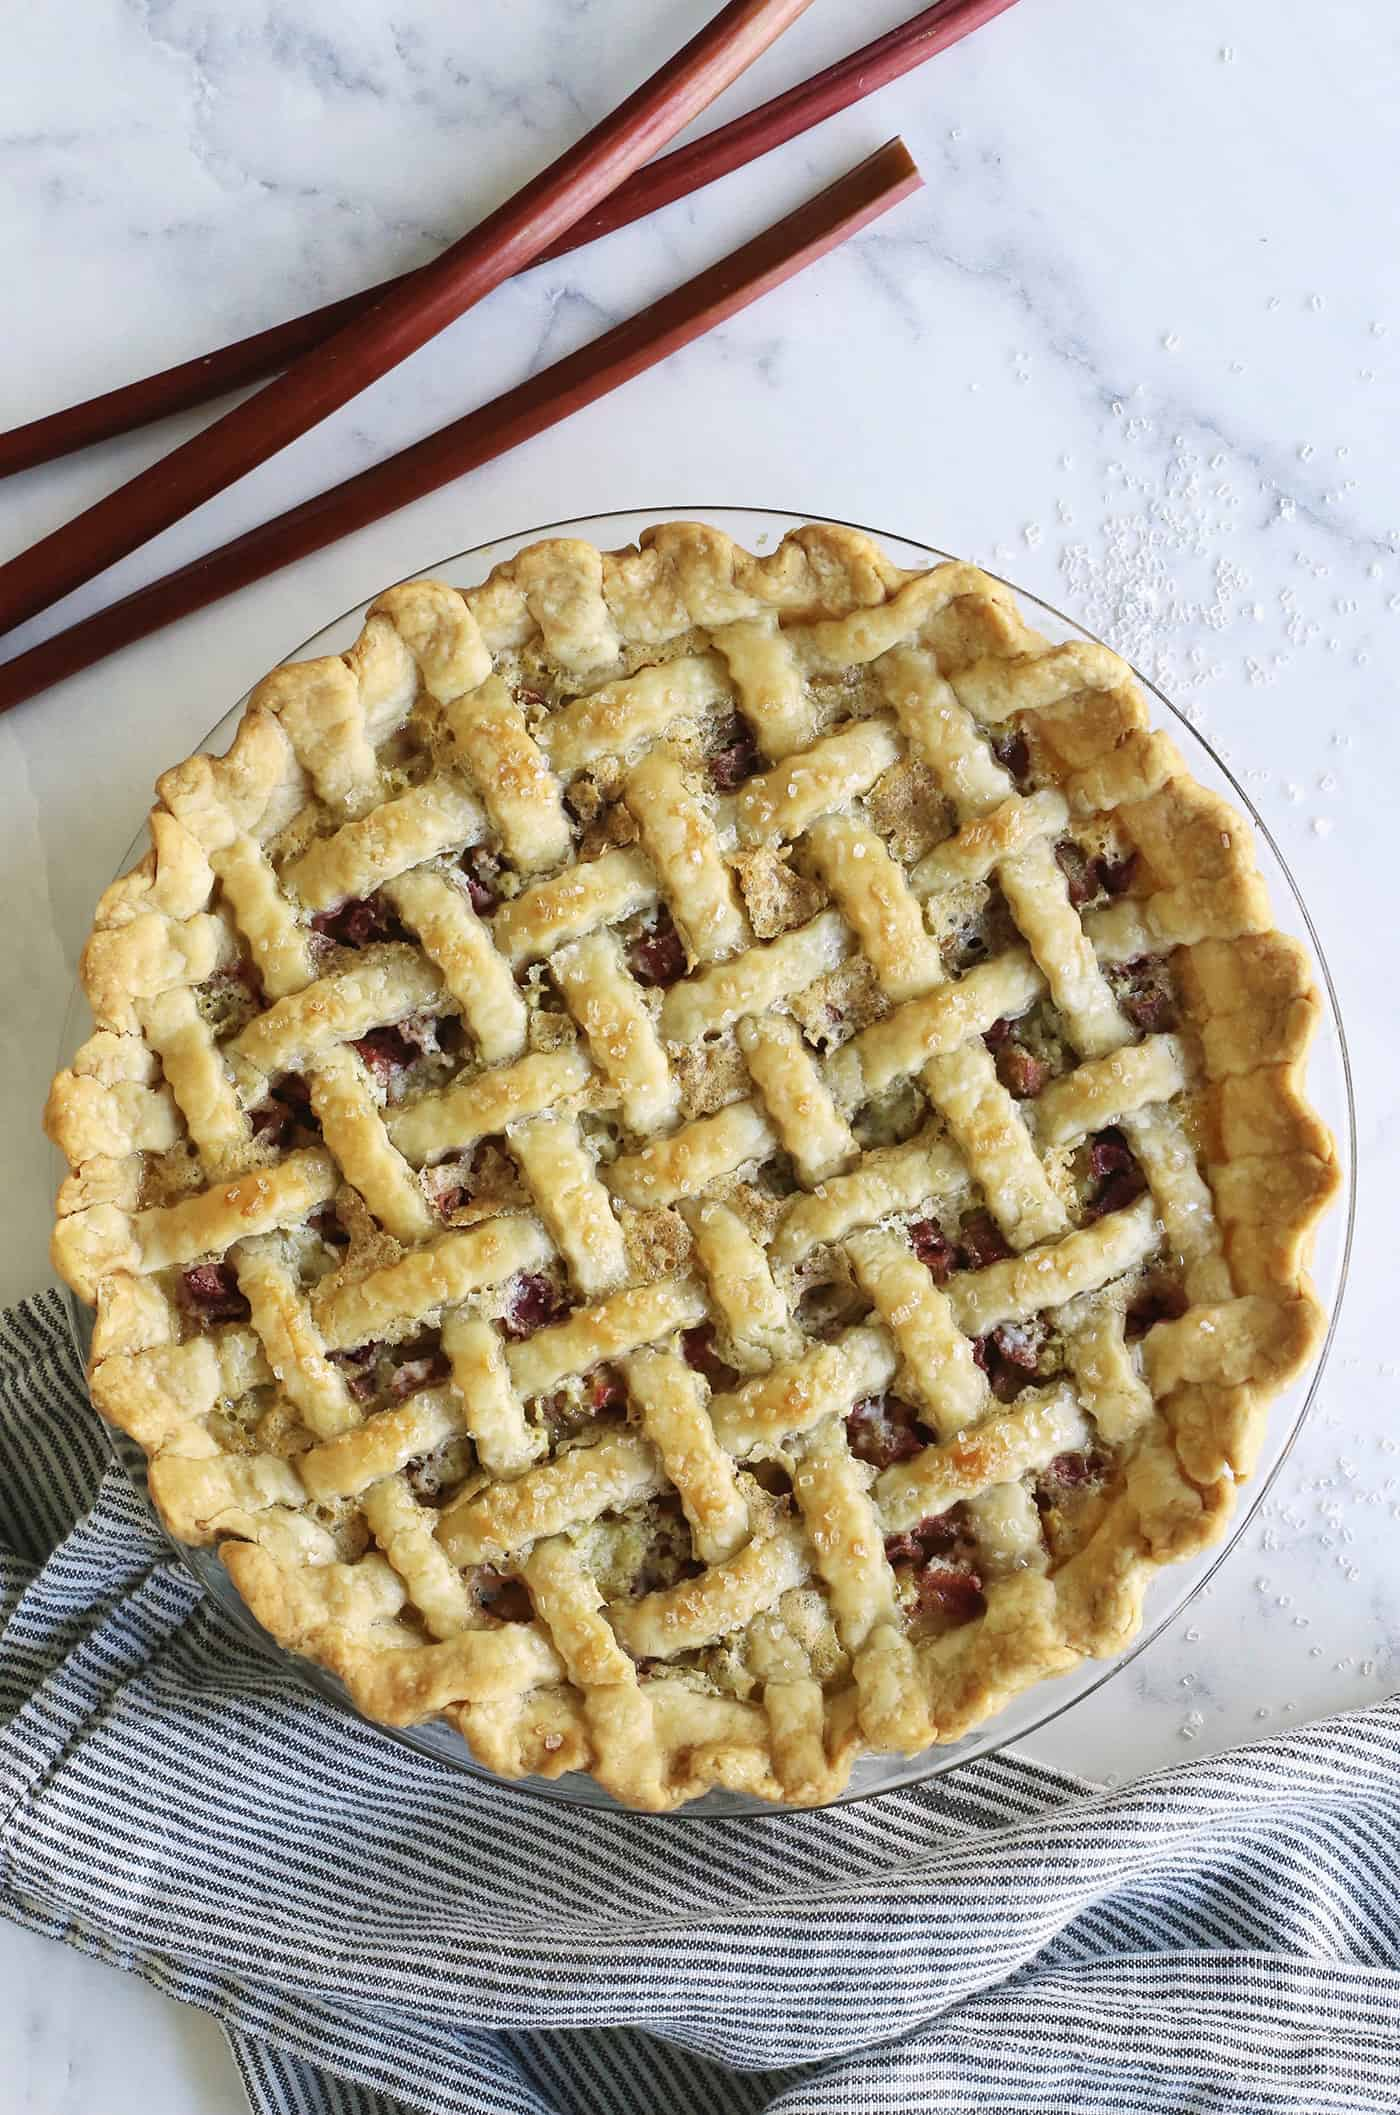 baked rhubarb custard pie with lattice crust